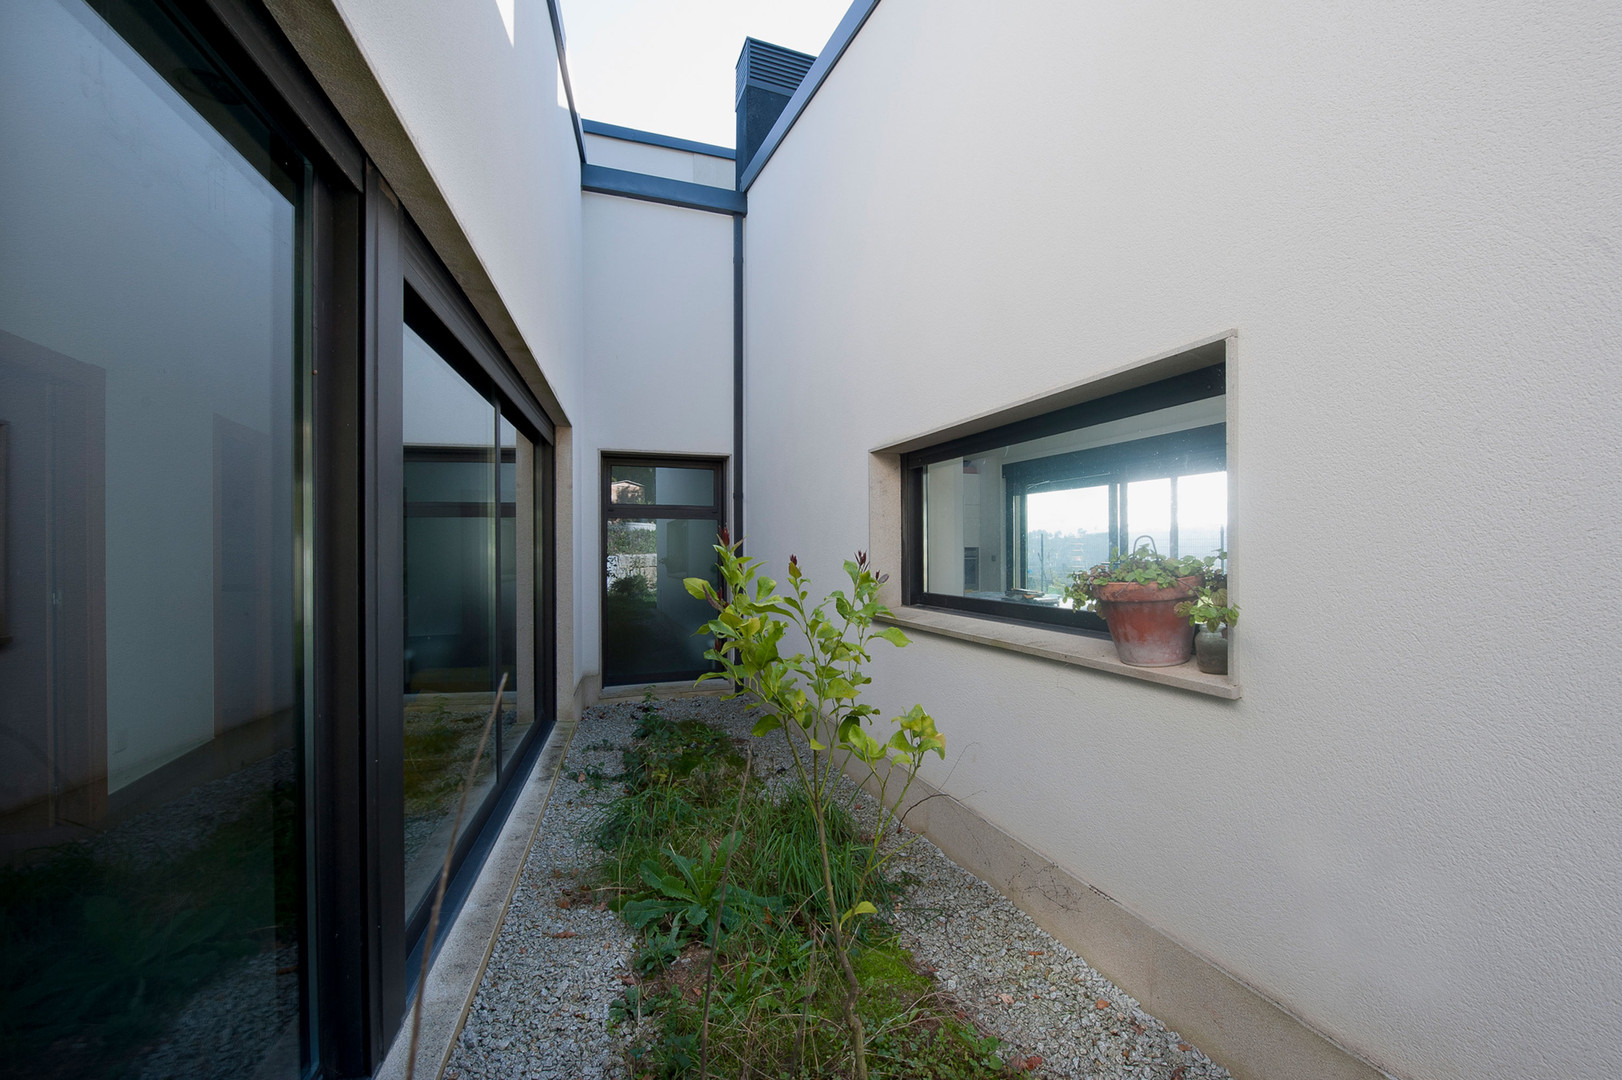 arquitectura-senmais-06.23.06.jpg